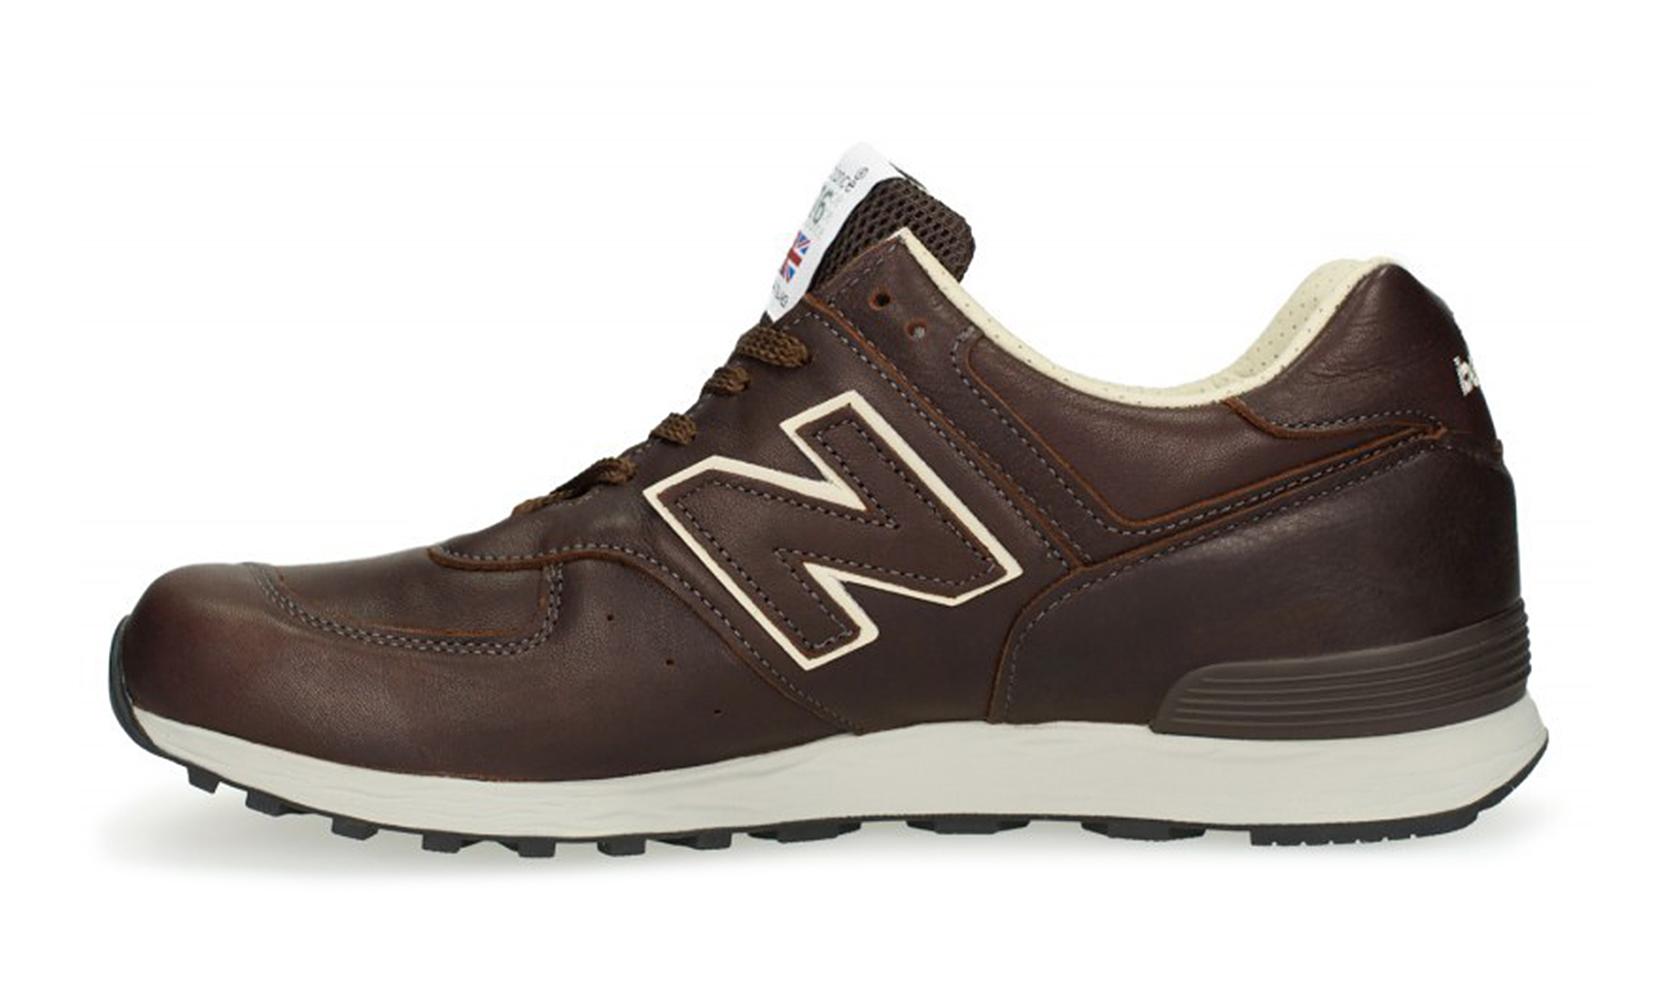 Чоловіче взуття повсякденне New Balance 576 Made in UK M576CBB | New Balance